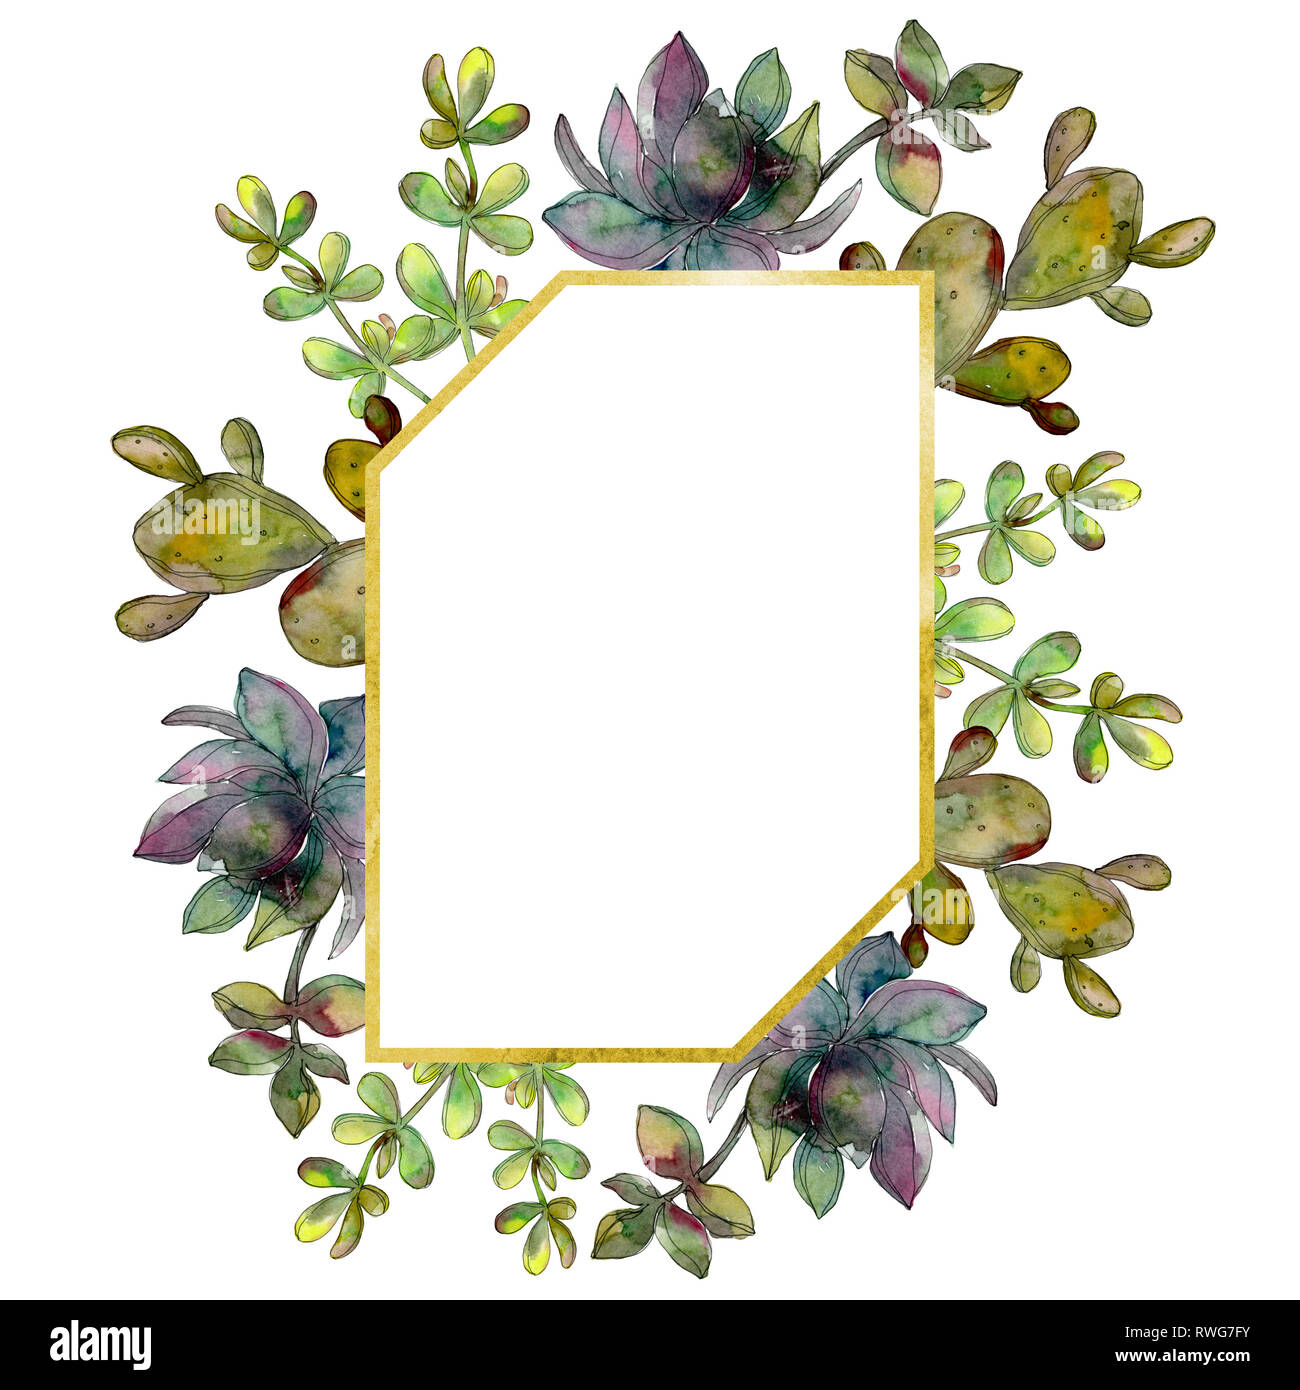 Jungle Botanical Succulent Flower Watercolor Background Illustration Set Frame Border Crystal Ornament Square Stock Photo Alamy